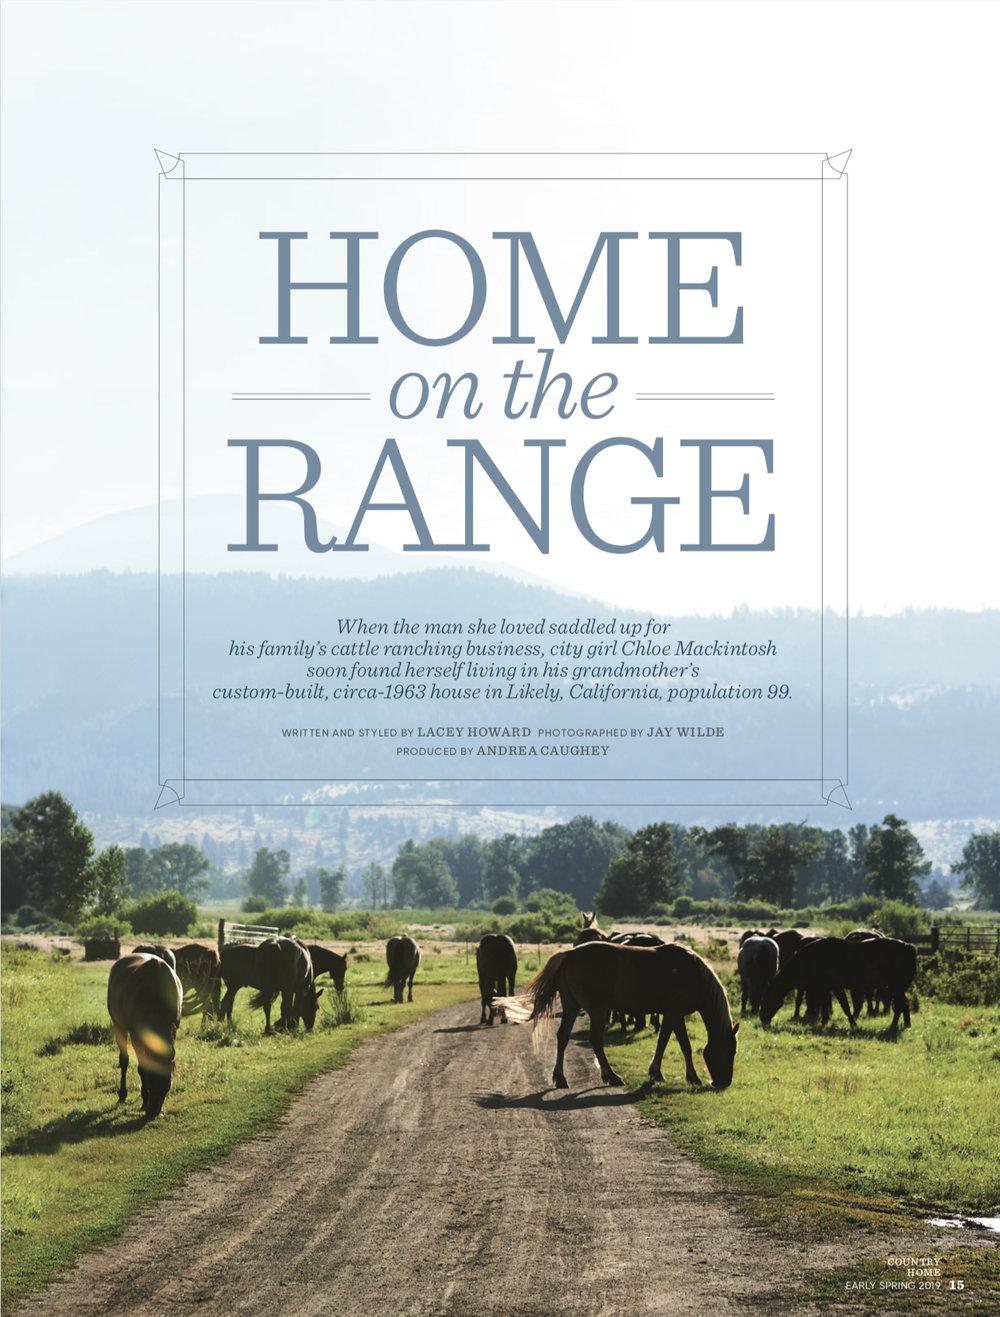 Authentic+farmhouse+home+tour+|+country+home+magazine copy.jpg